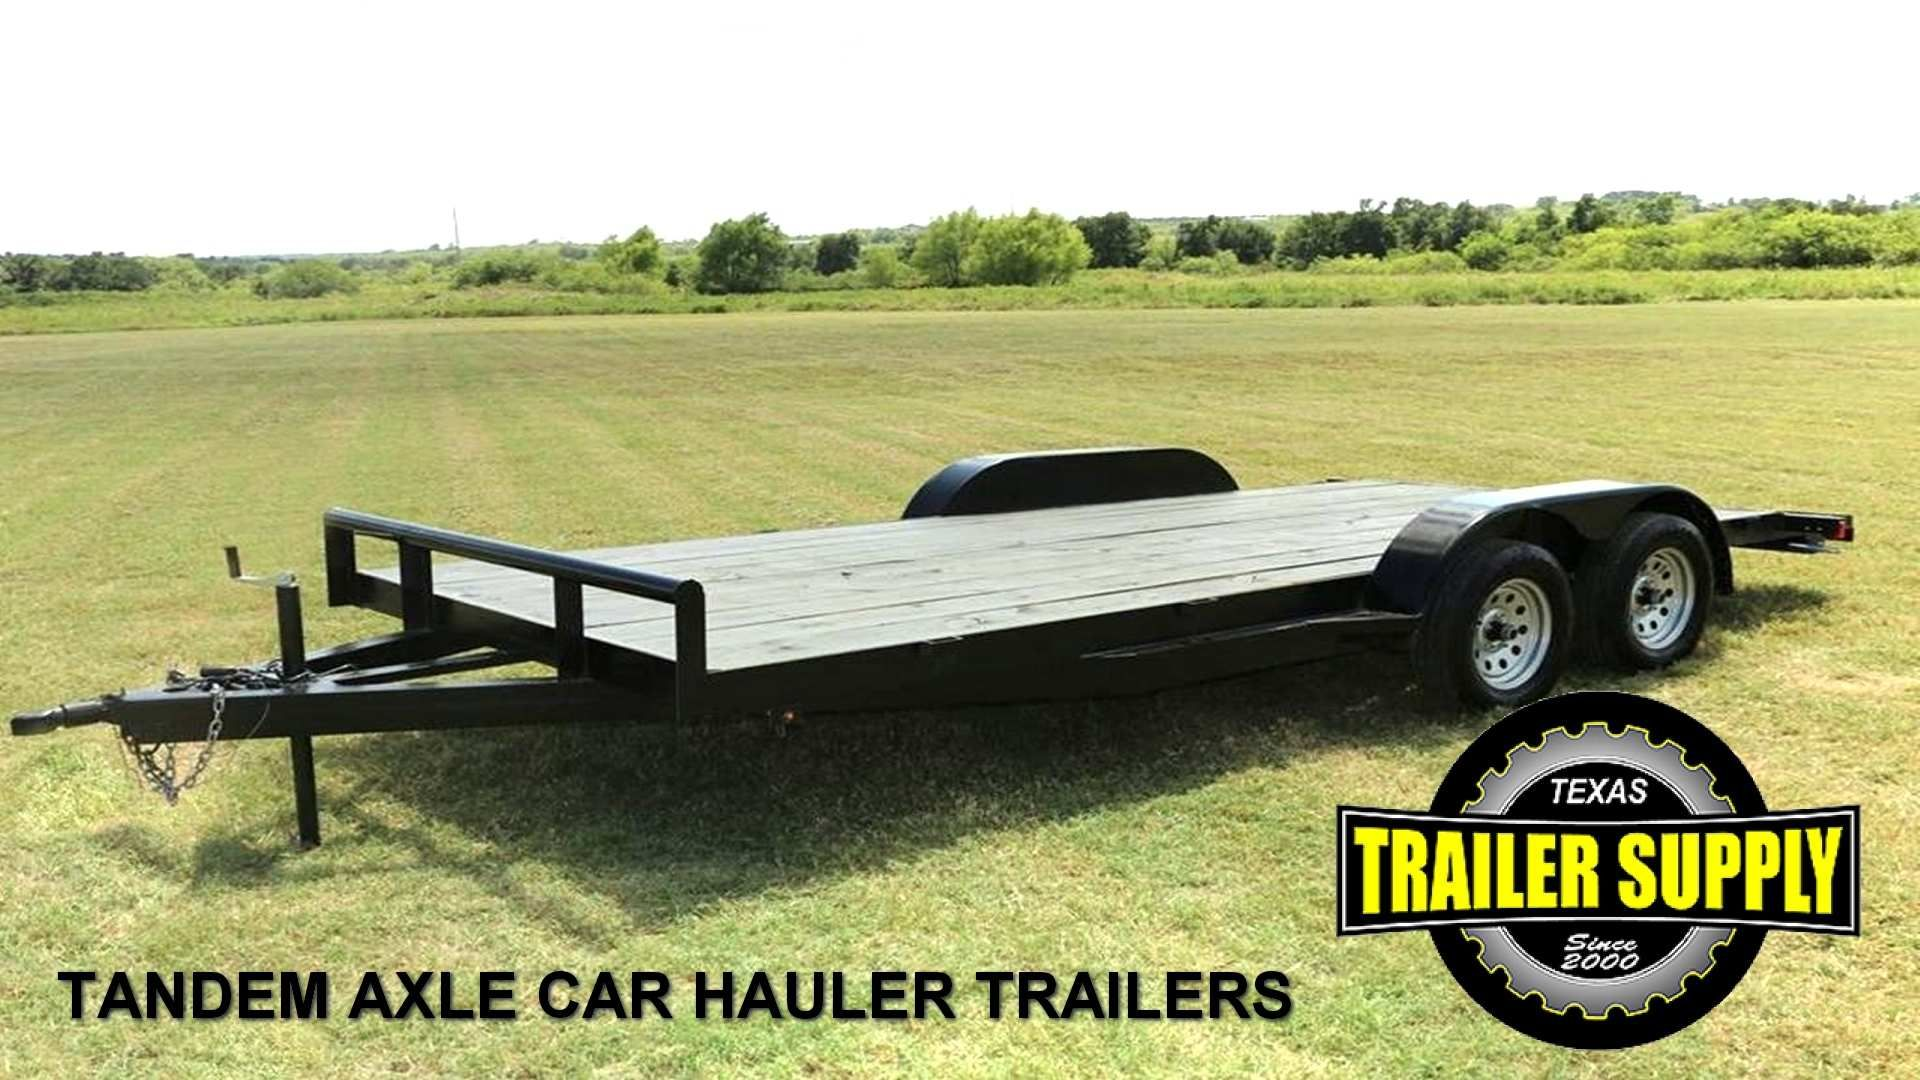 View All Car Hauler Trailers Car Hauler Trailer Trailer Landscape Trailers